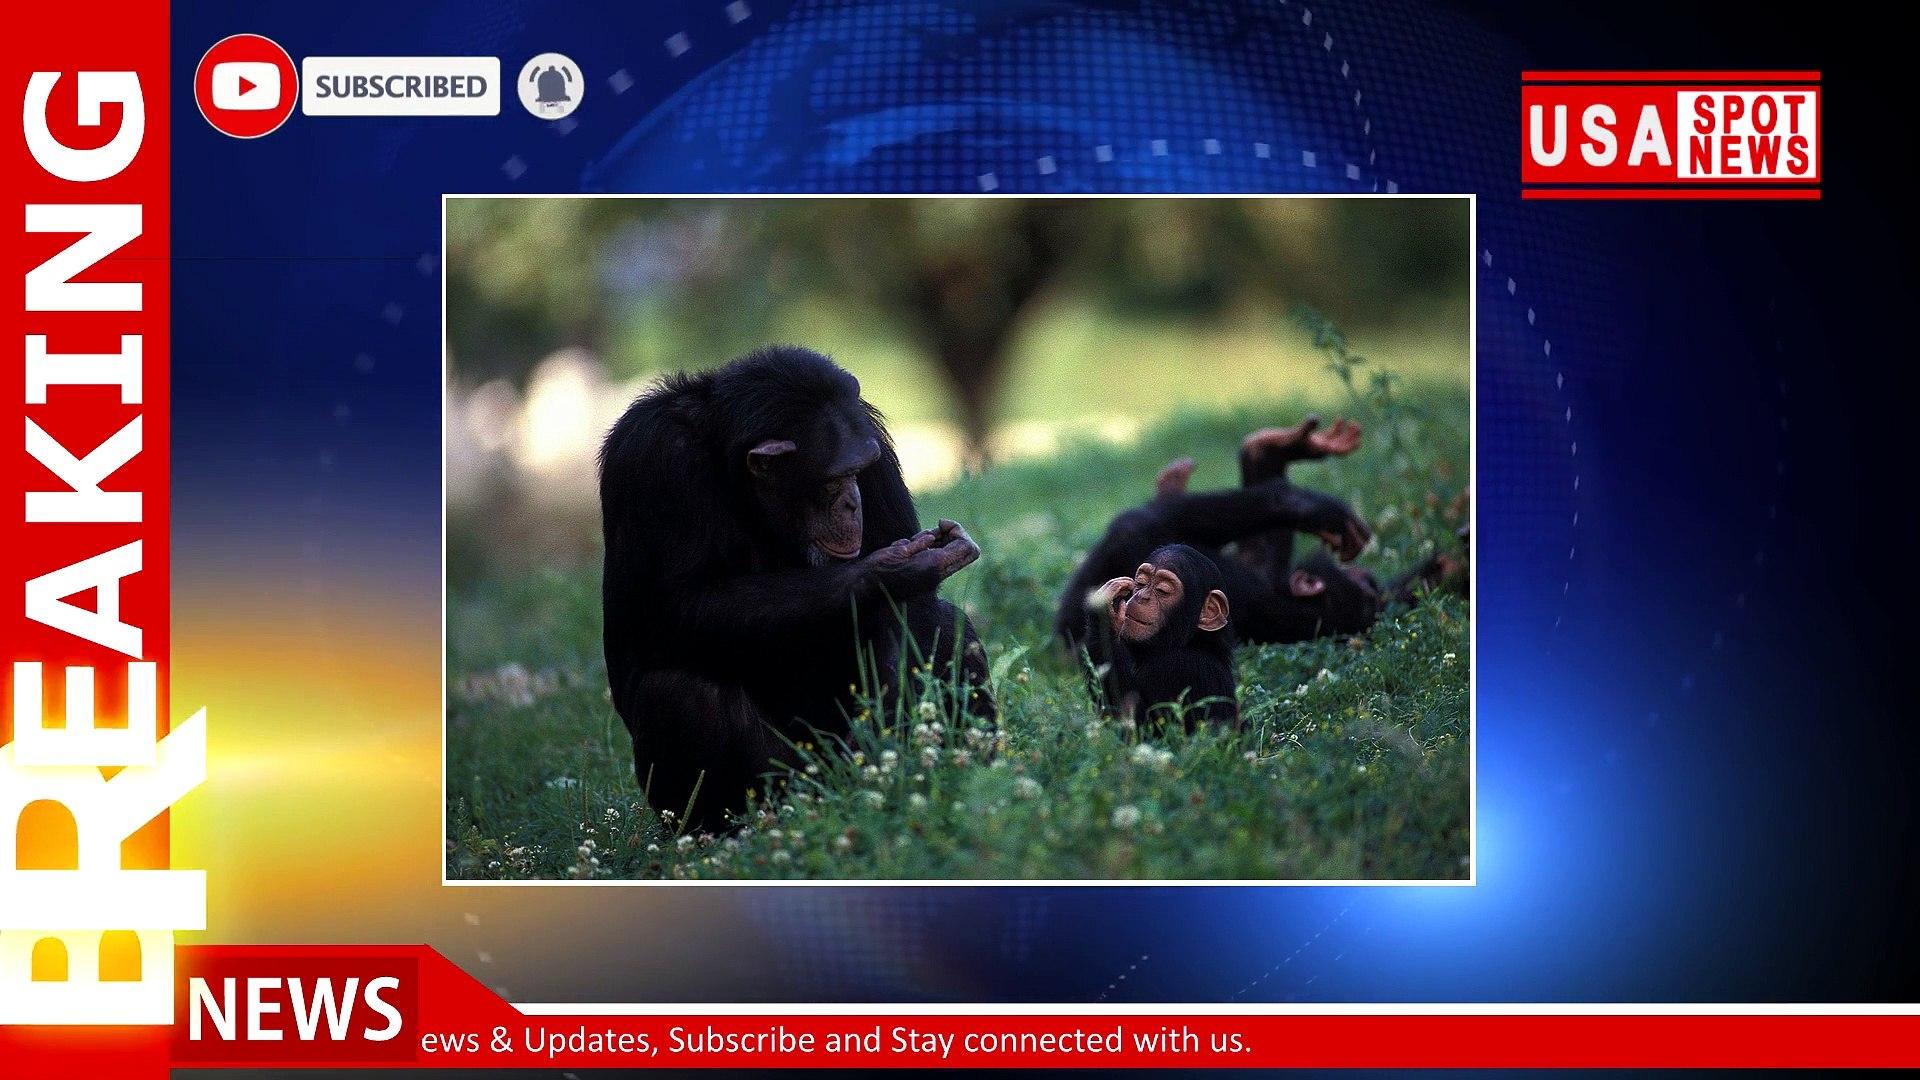 04 Feb 2021 | Morning News Headlines | Breaking News | News Today | USA Spot News